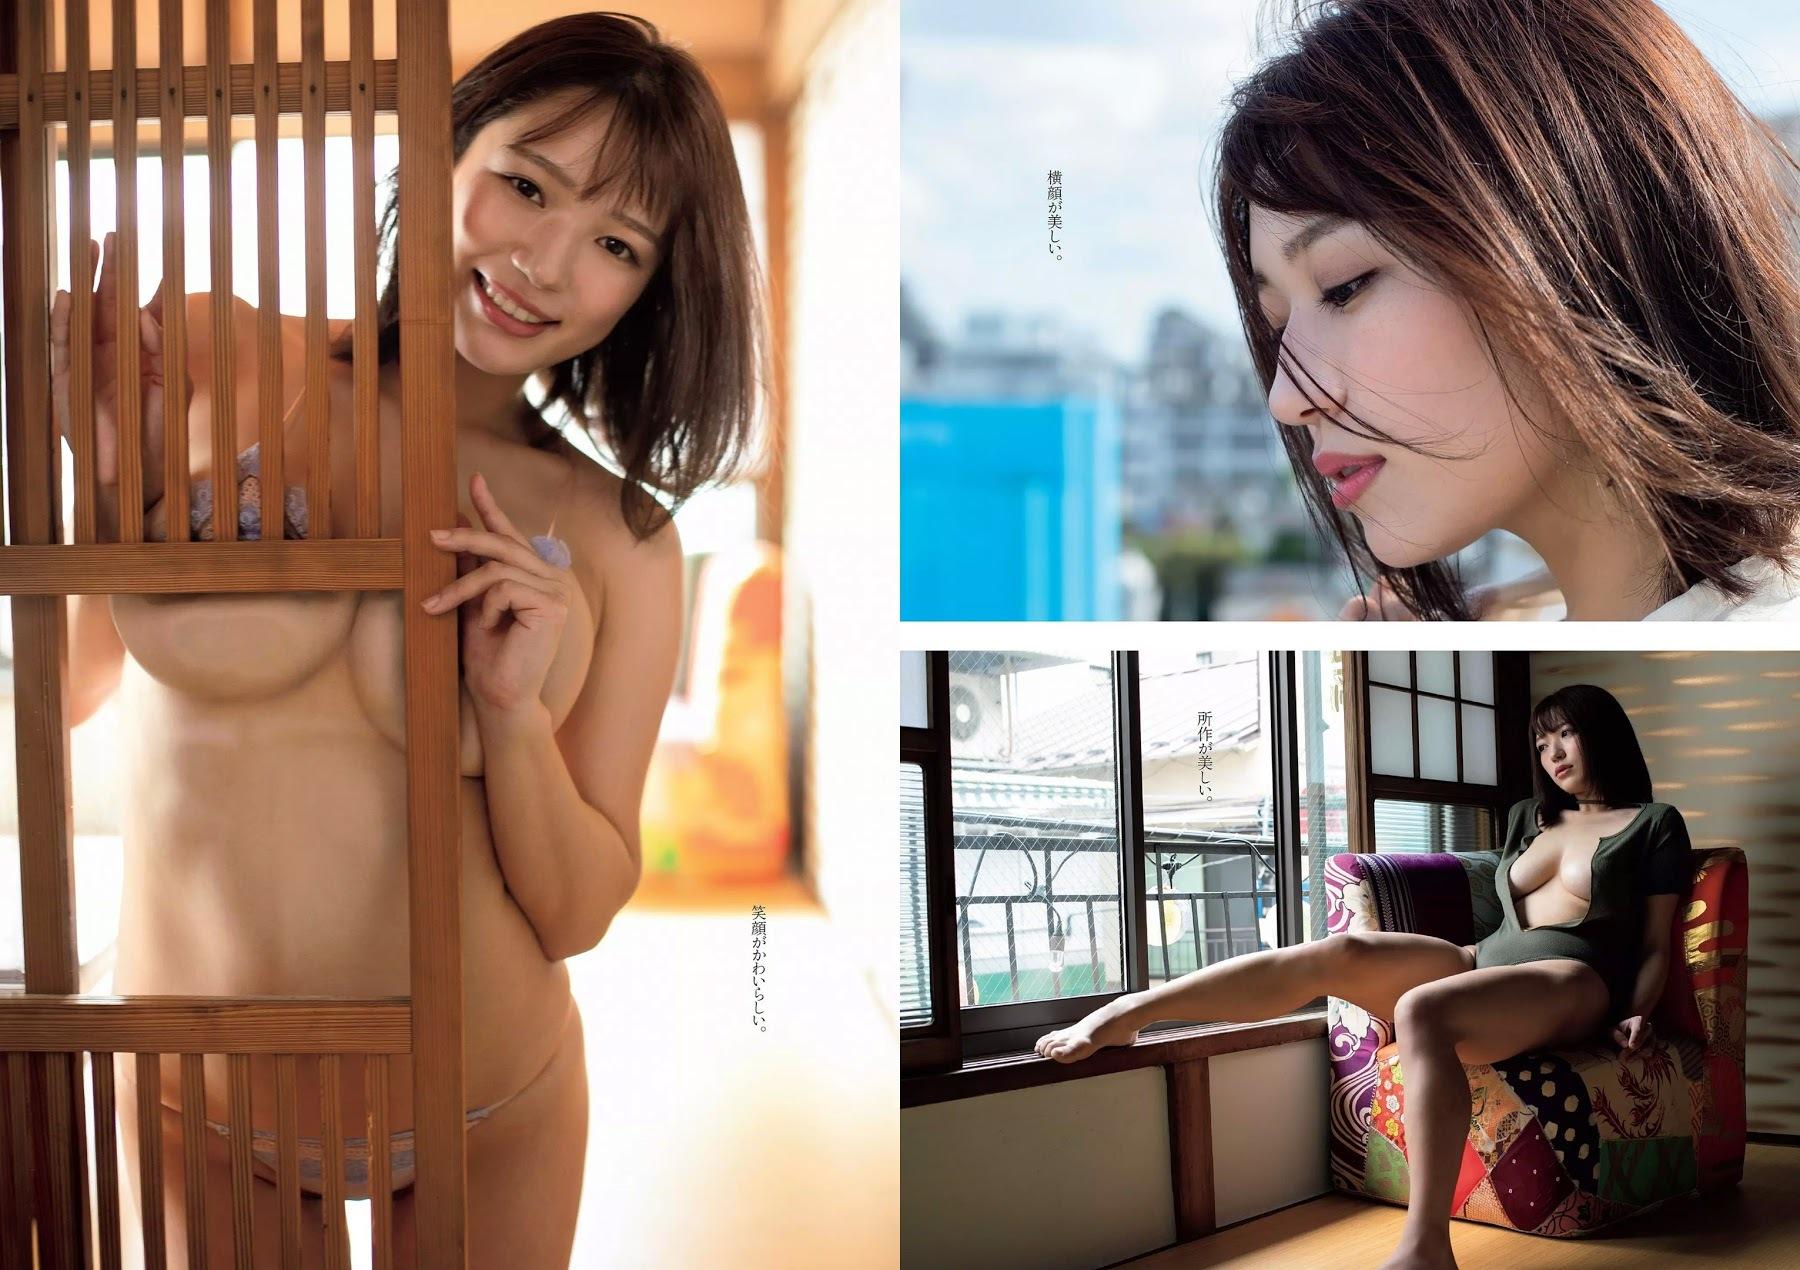 Former nurse with bigtits, slender and idolloving beauty Shiro Seyama Swimsuit Gravure 2020002